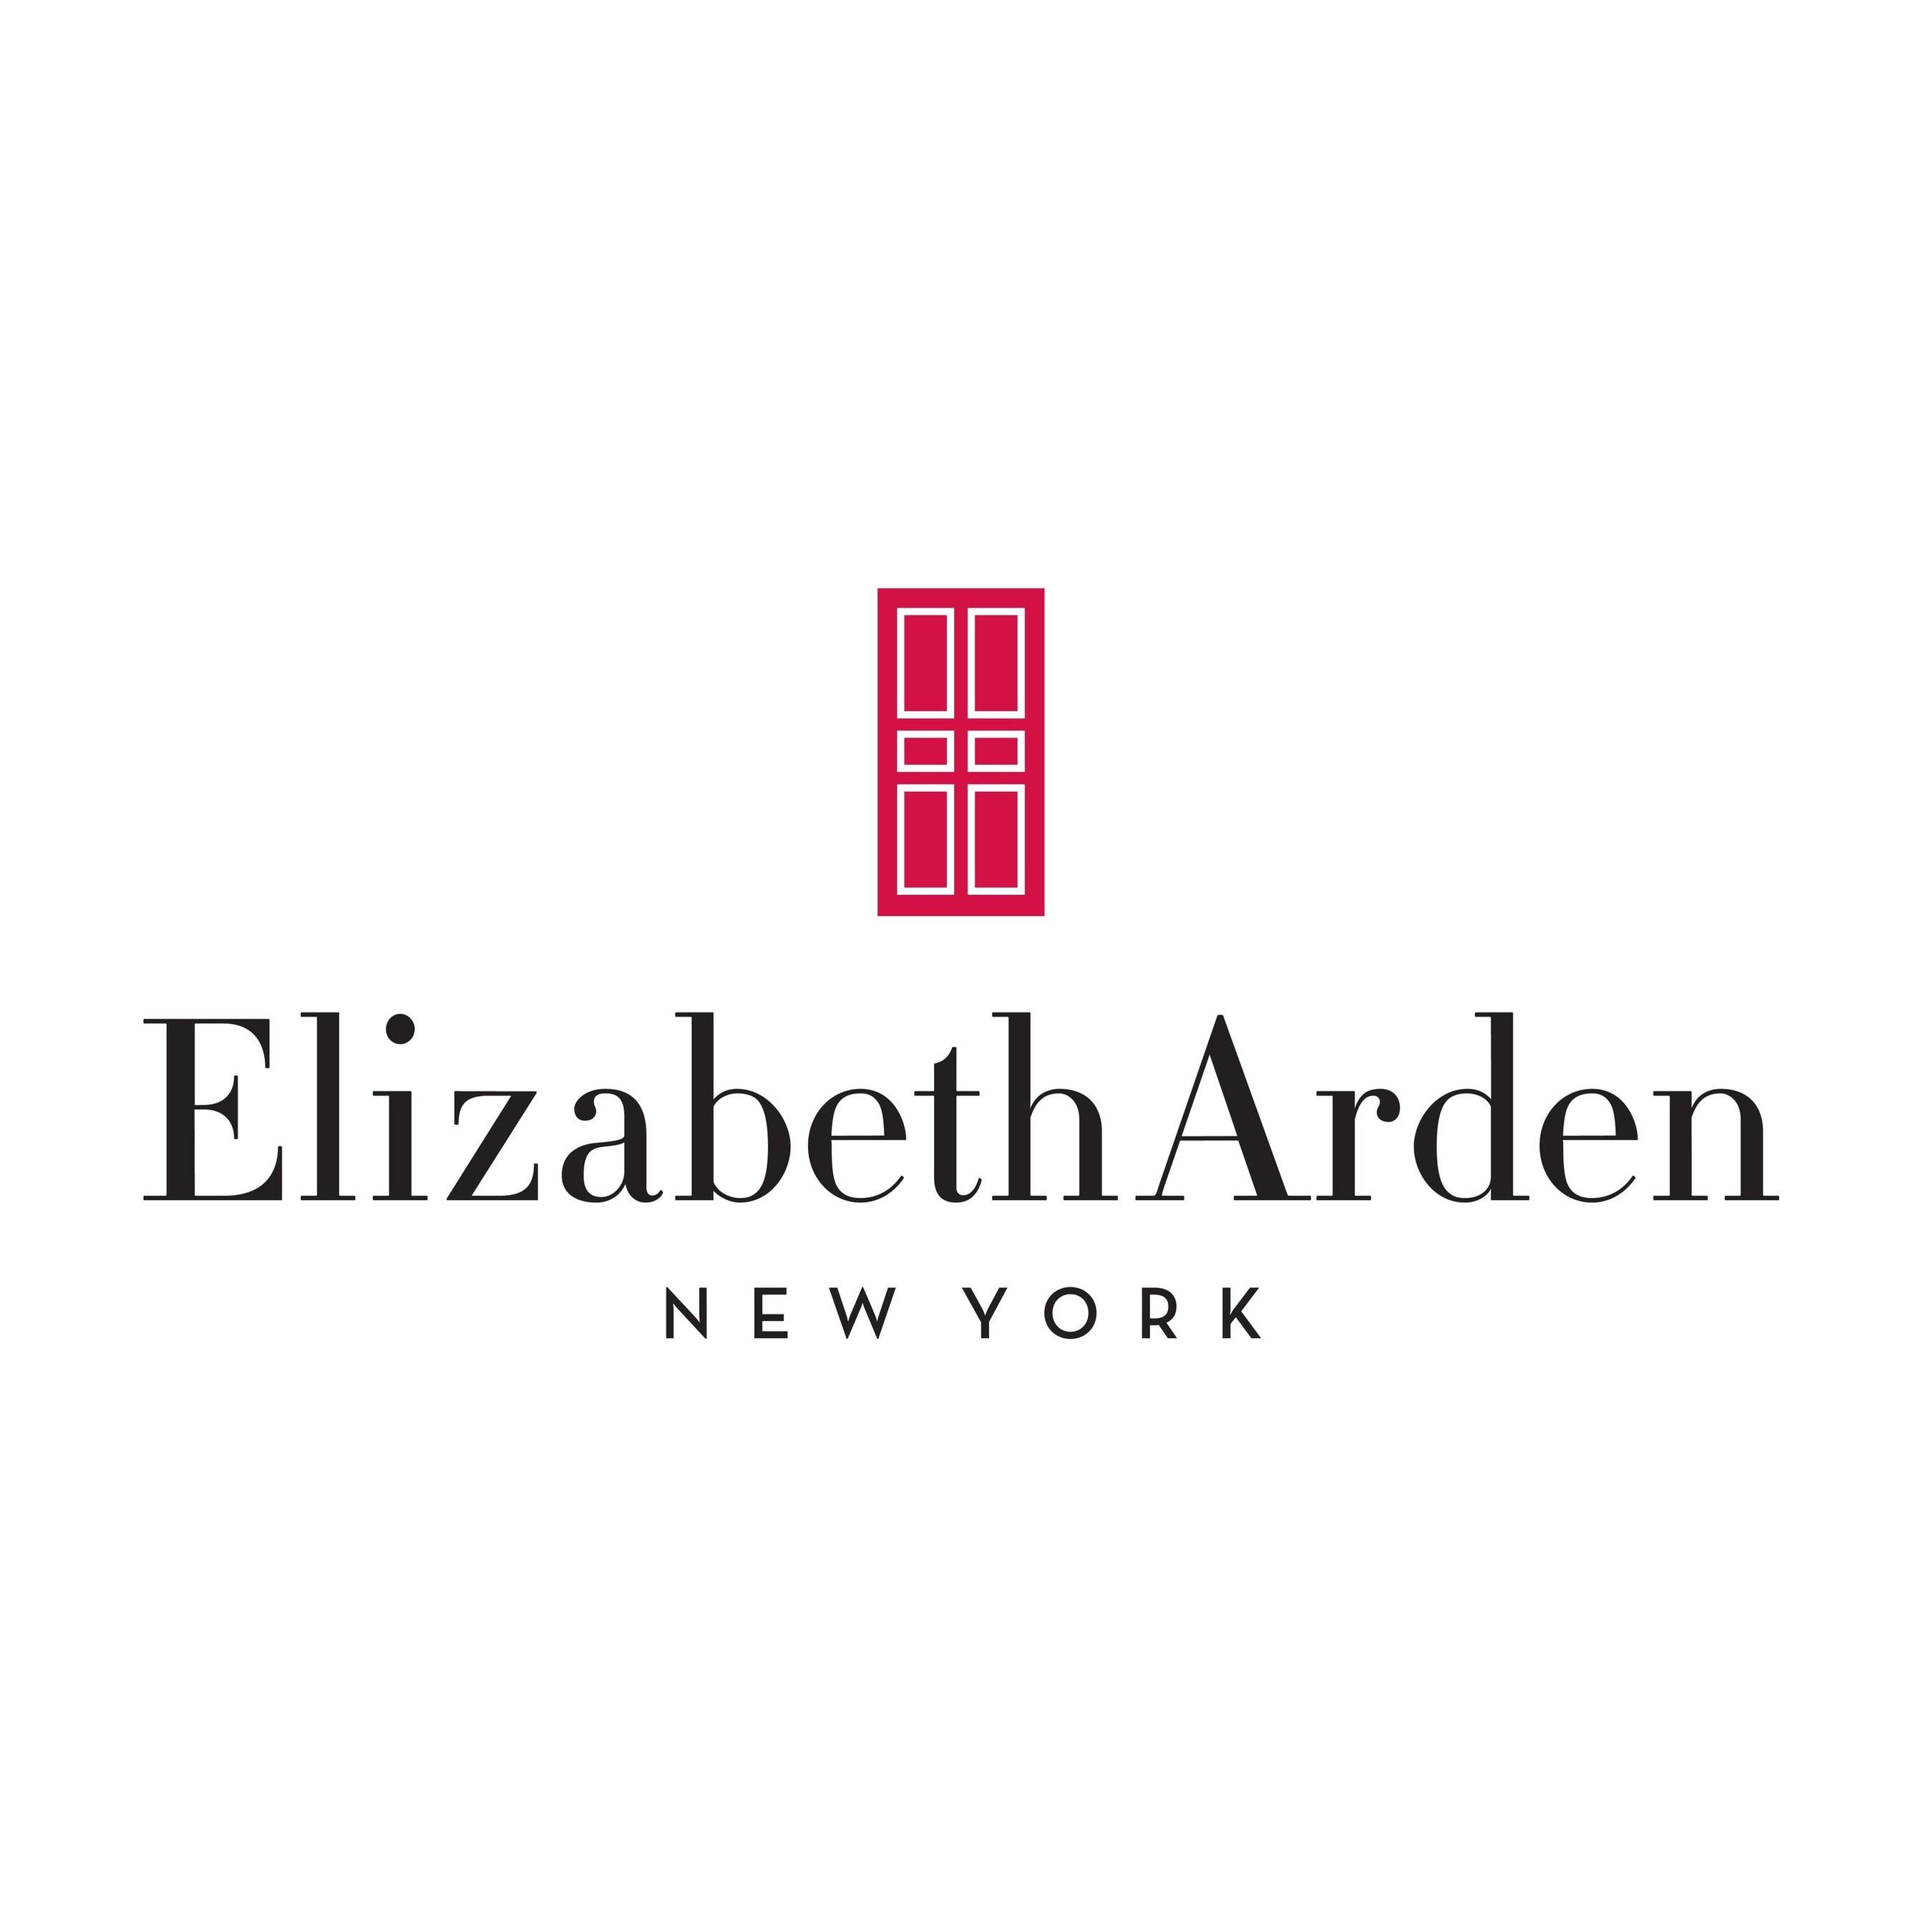 ELIZABETH ARDEN - ADELINE